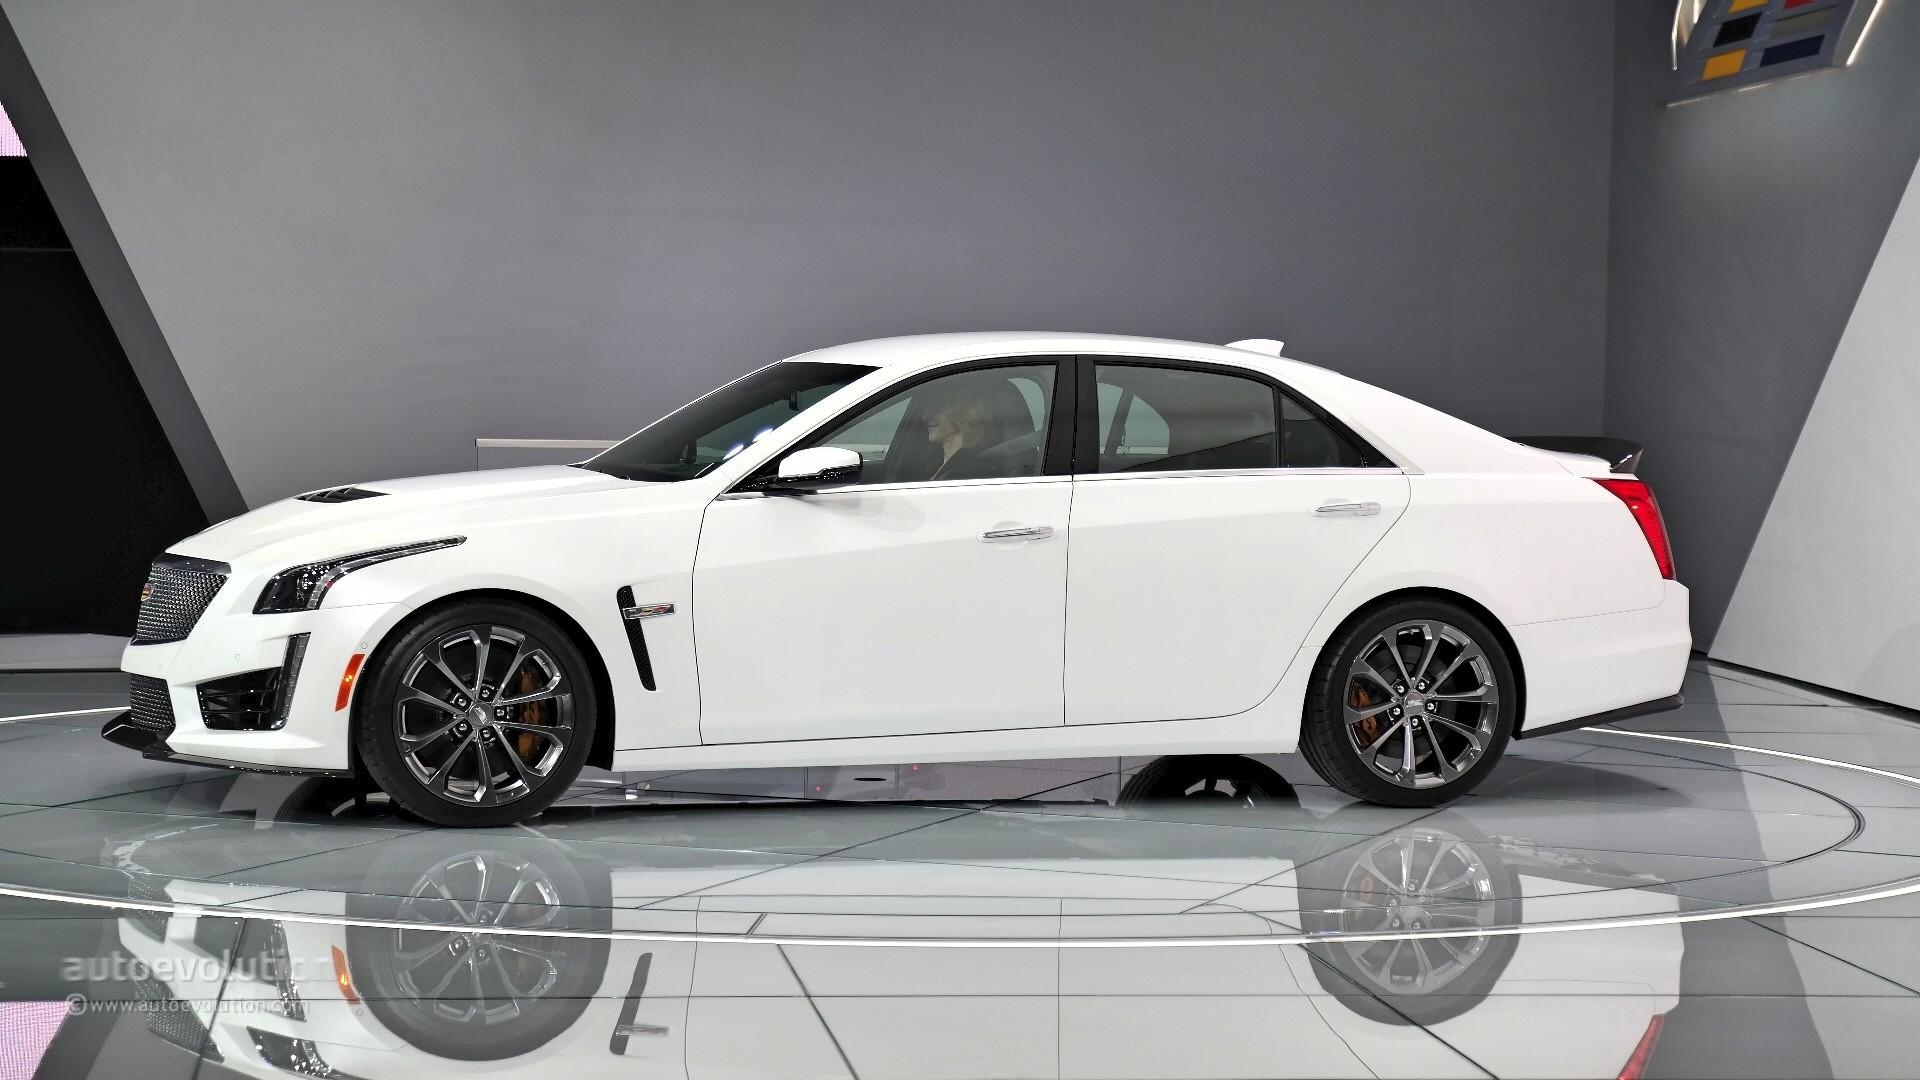 2016 Cadillac Cts V Shows Detroit What A Performance Sedan